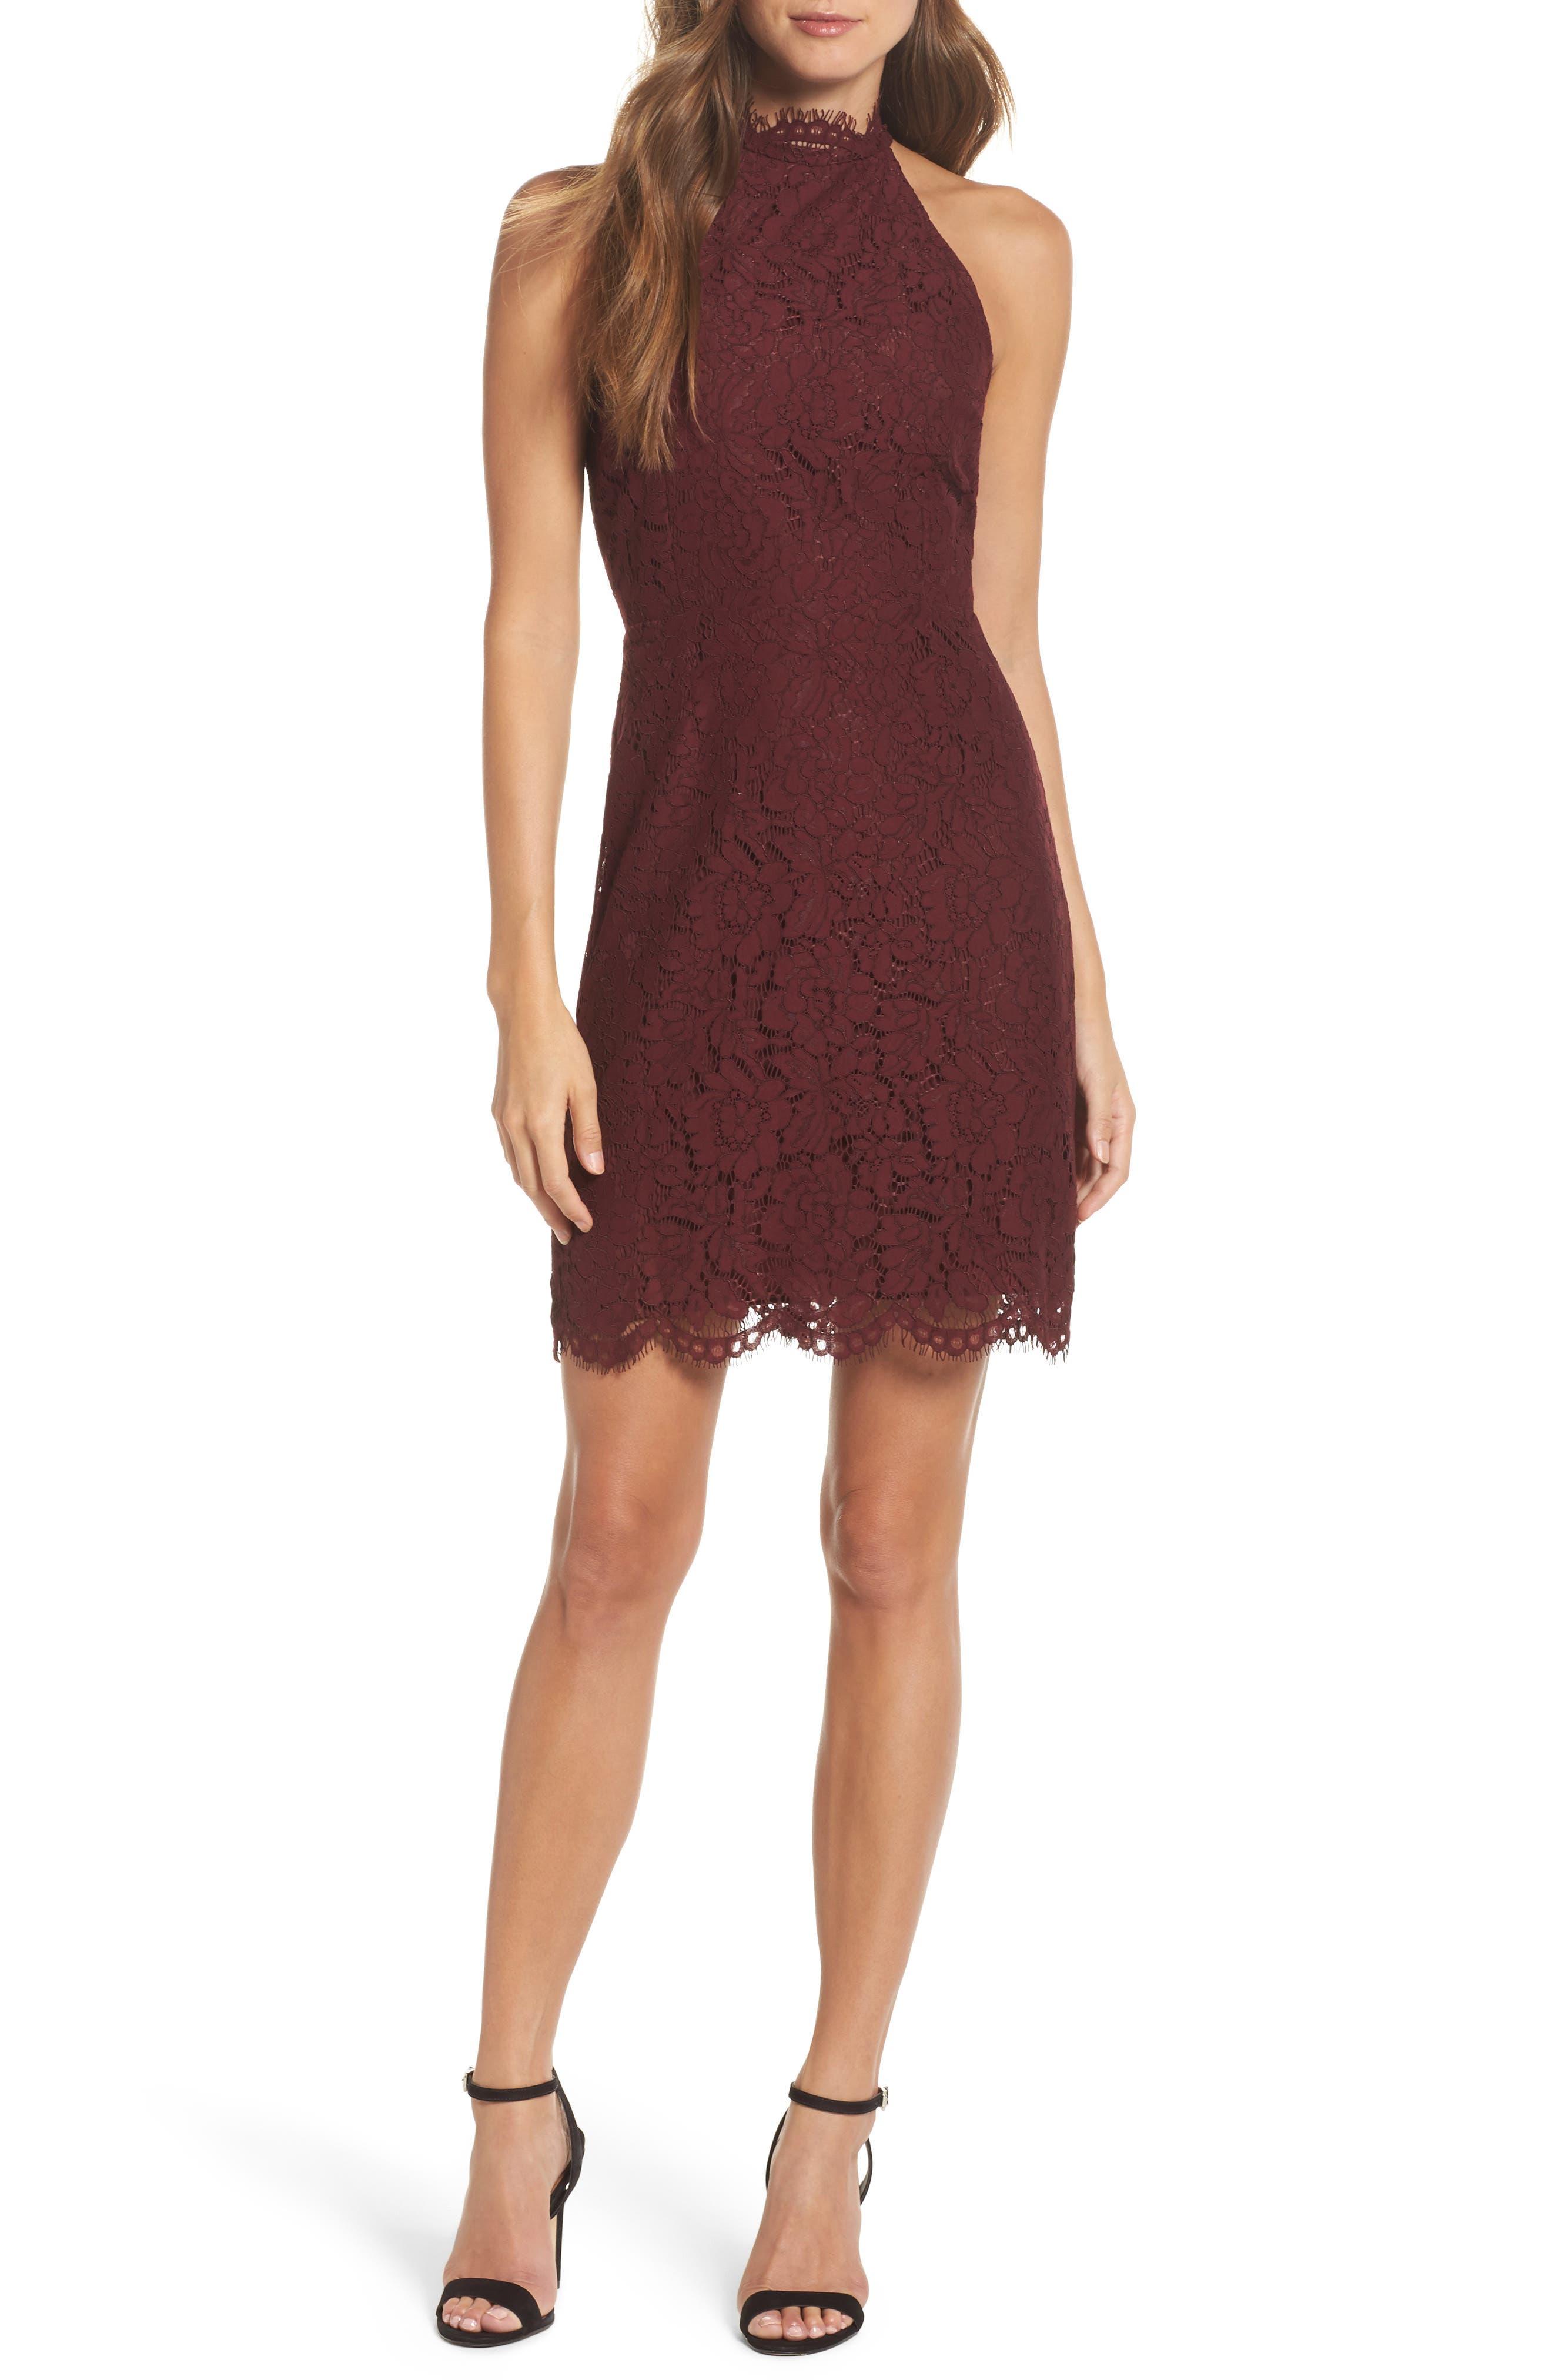 Alternate Image 1 Selected - BB Dakota 'Cara' High Neck Lace Dress